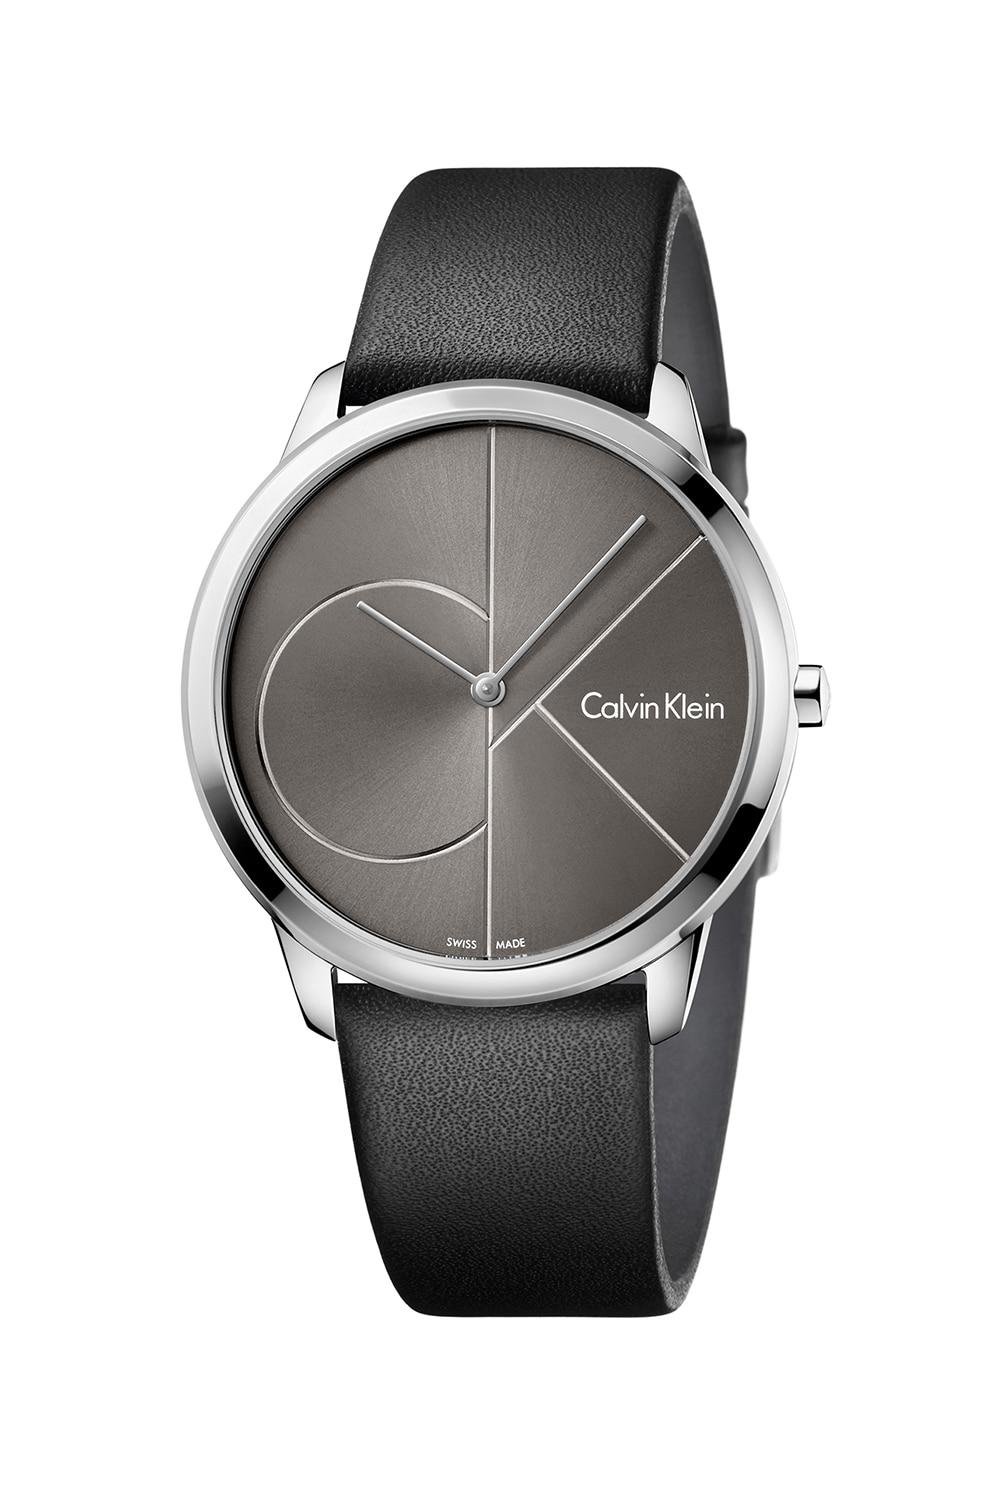 Fotografie Calvin Klein, Ceas analog cu logo pe cadran, Negru/Argintiu